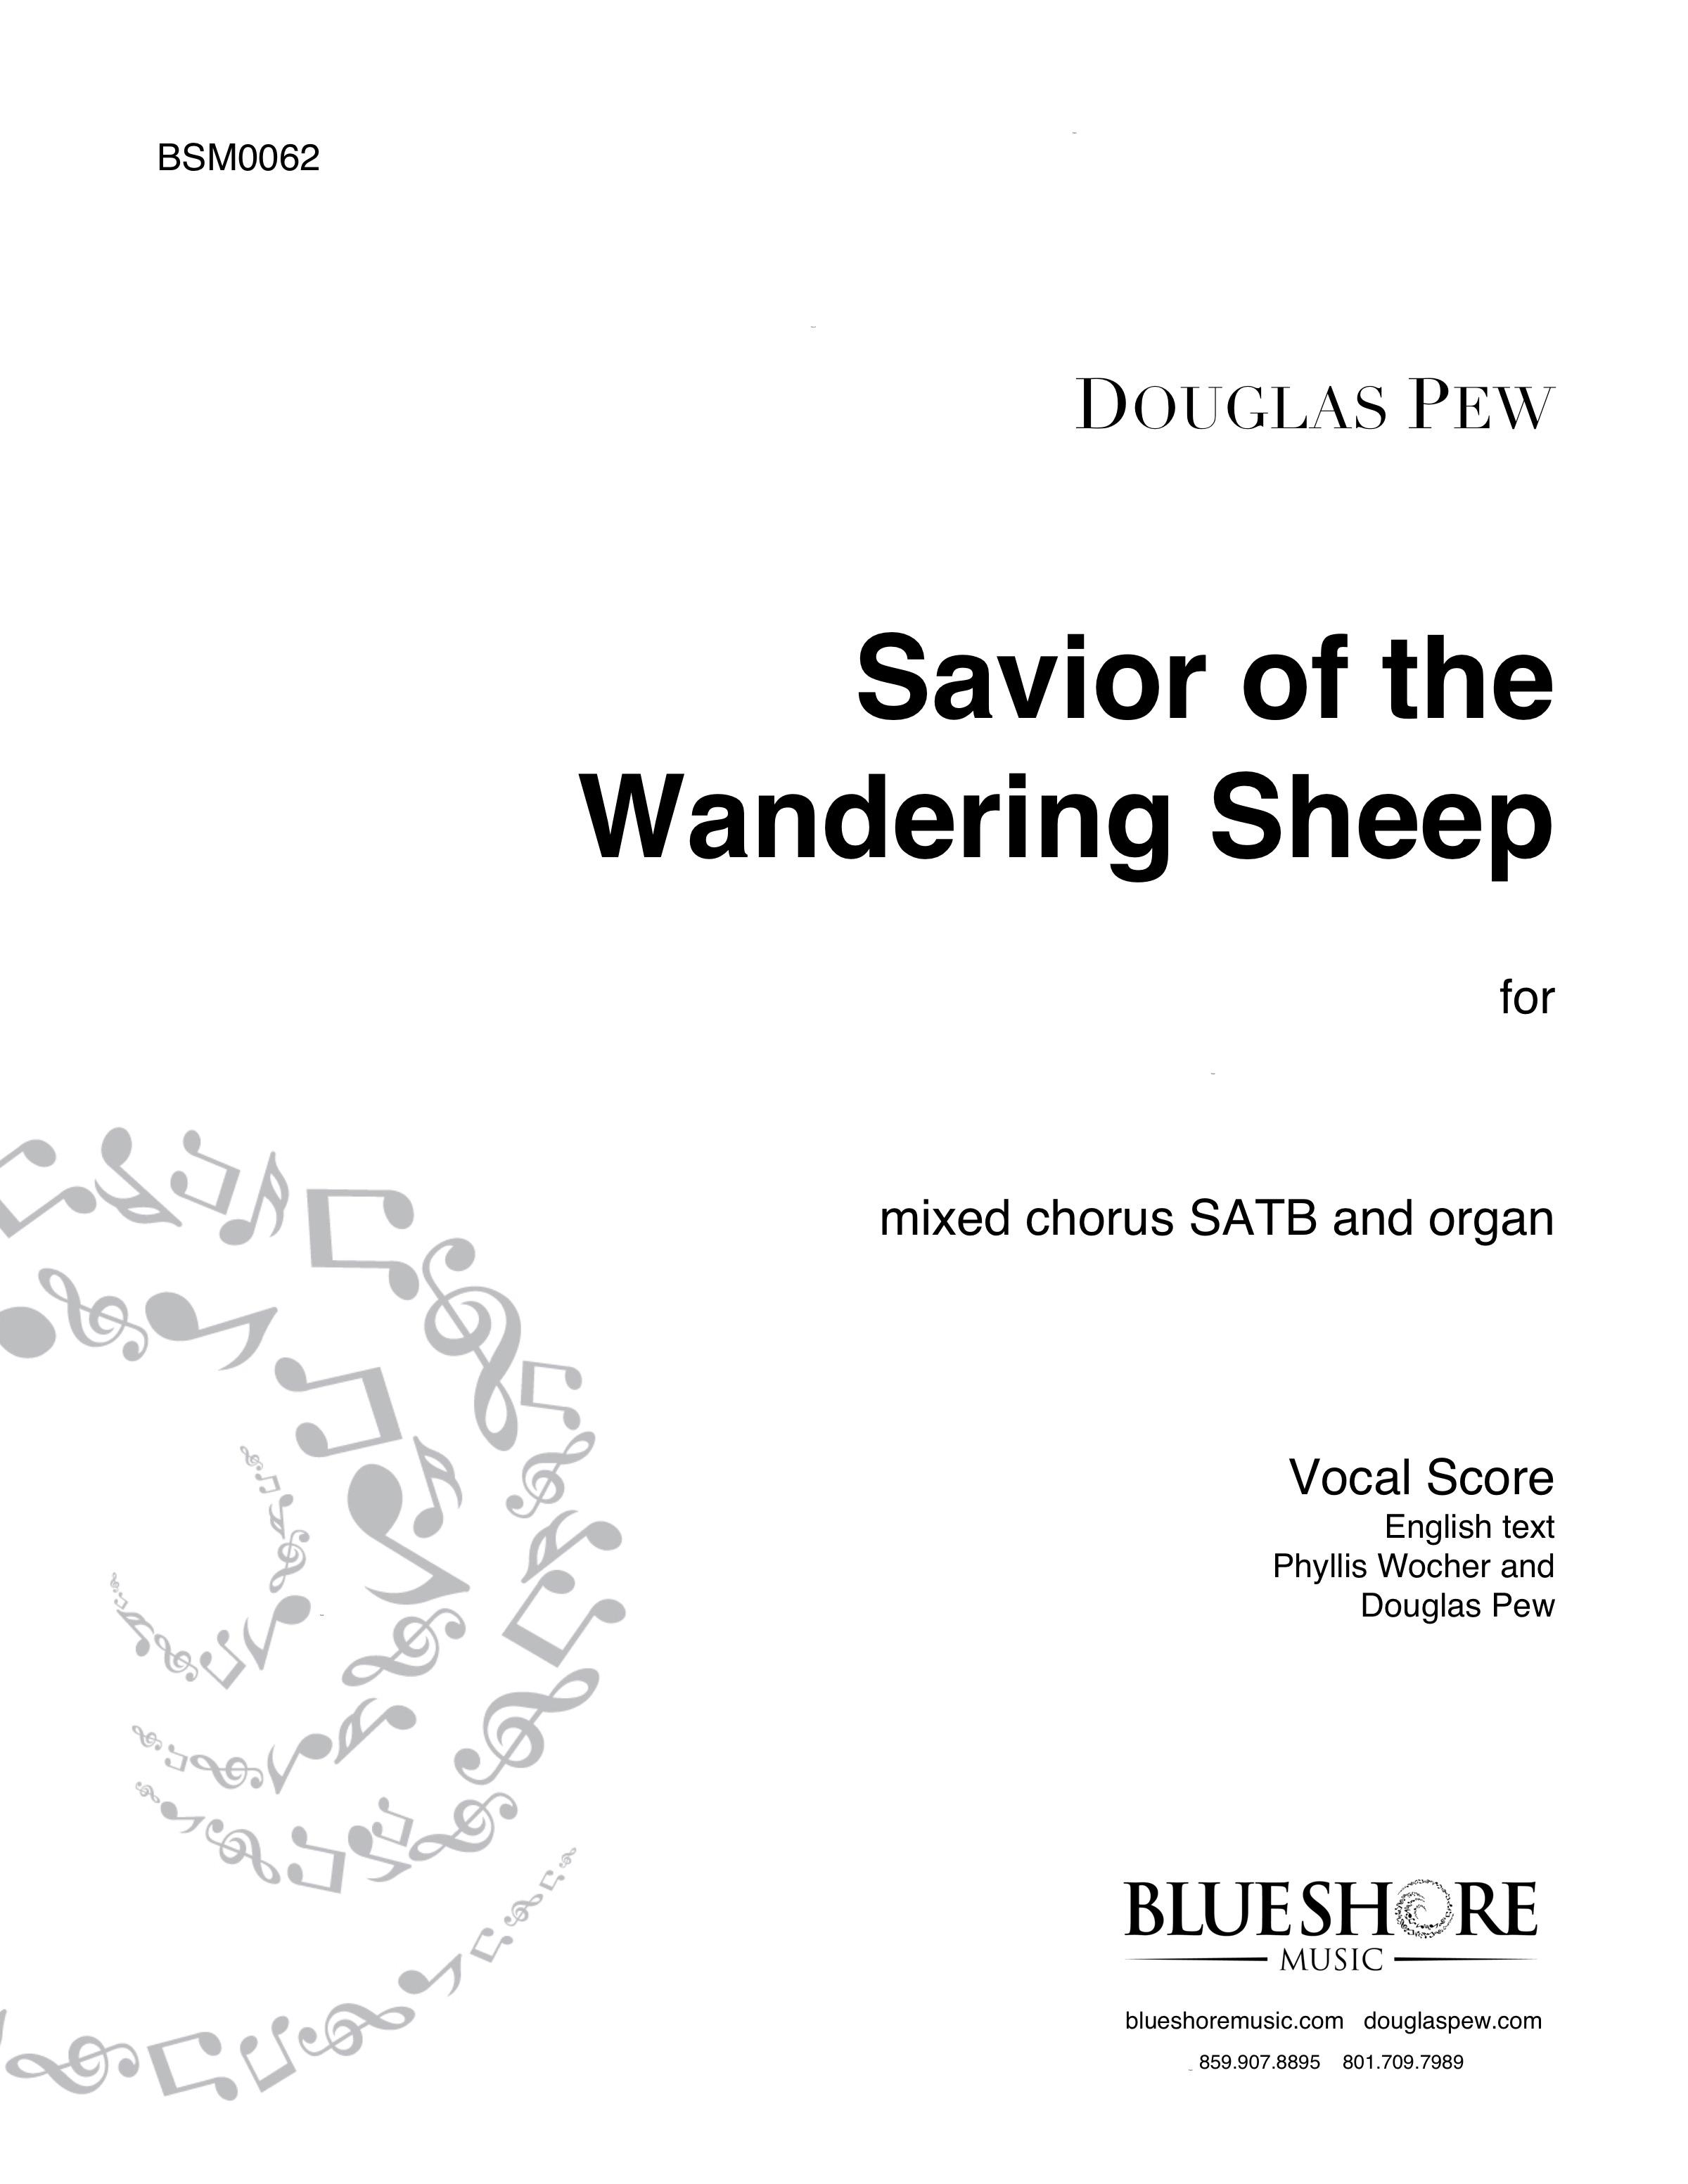 Savior of the Wandering Sheep